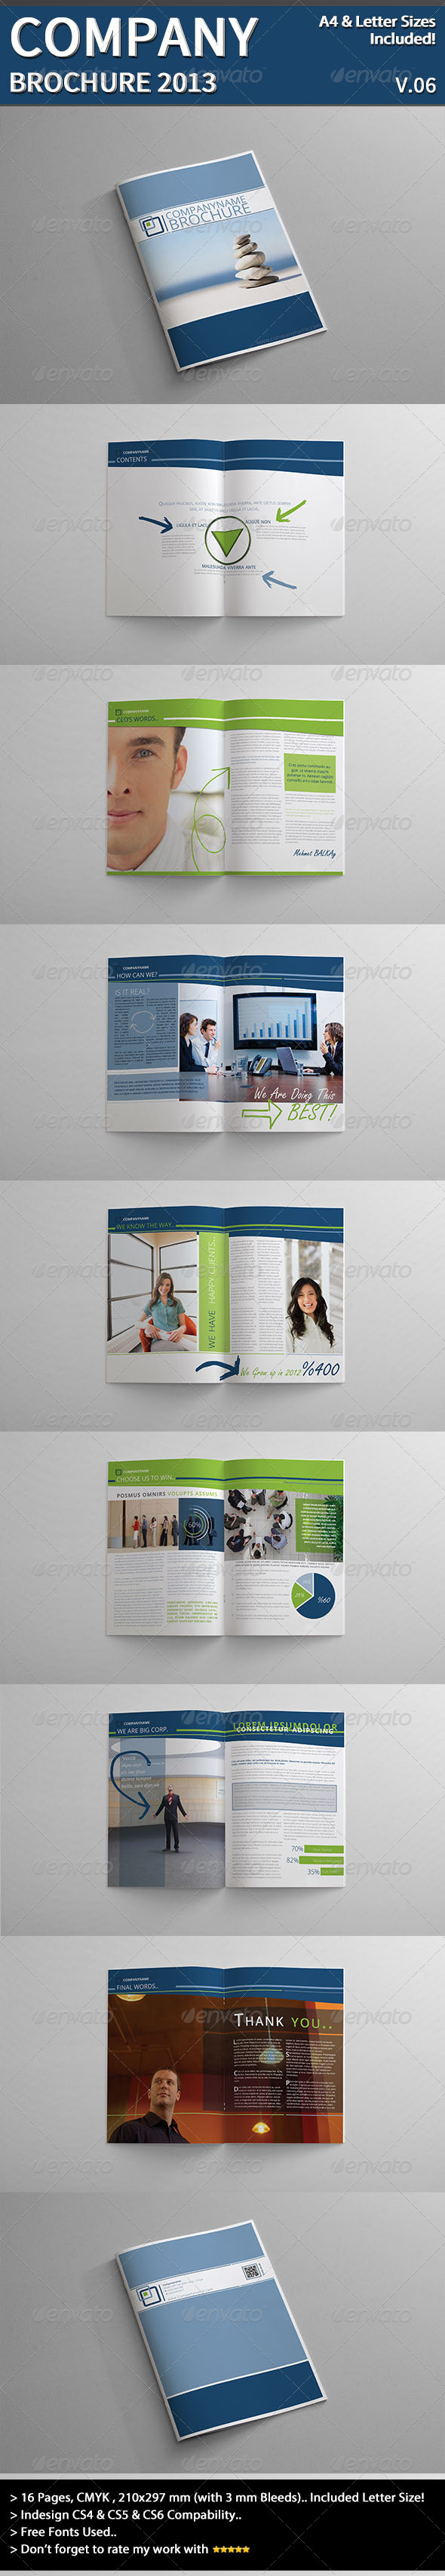 GraphicRiver Company Brochure 2013 Part 06 4083838